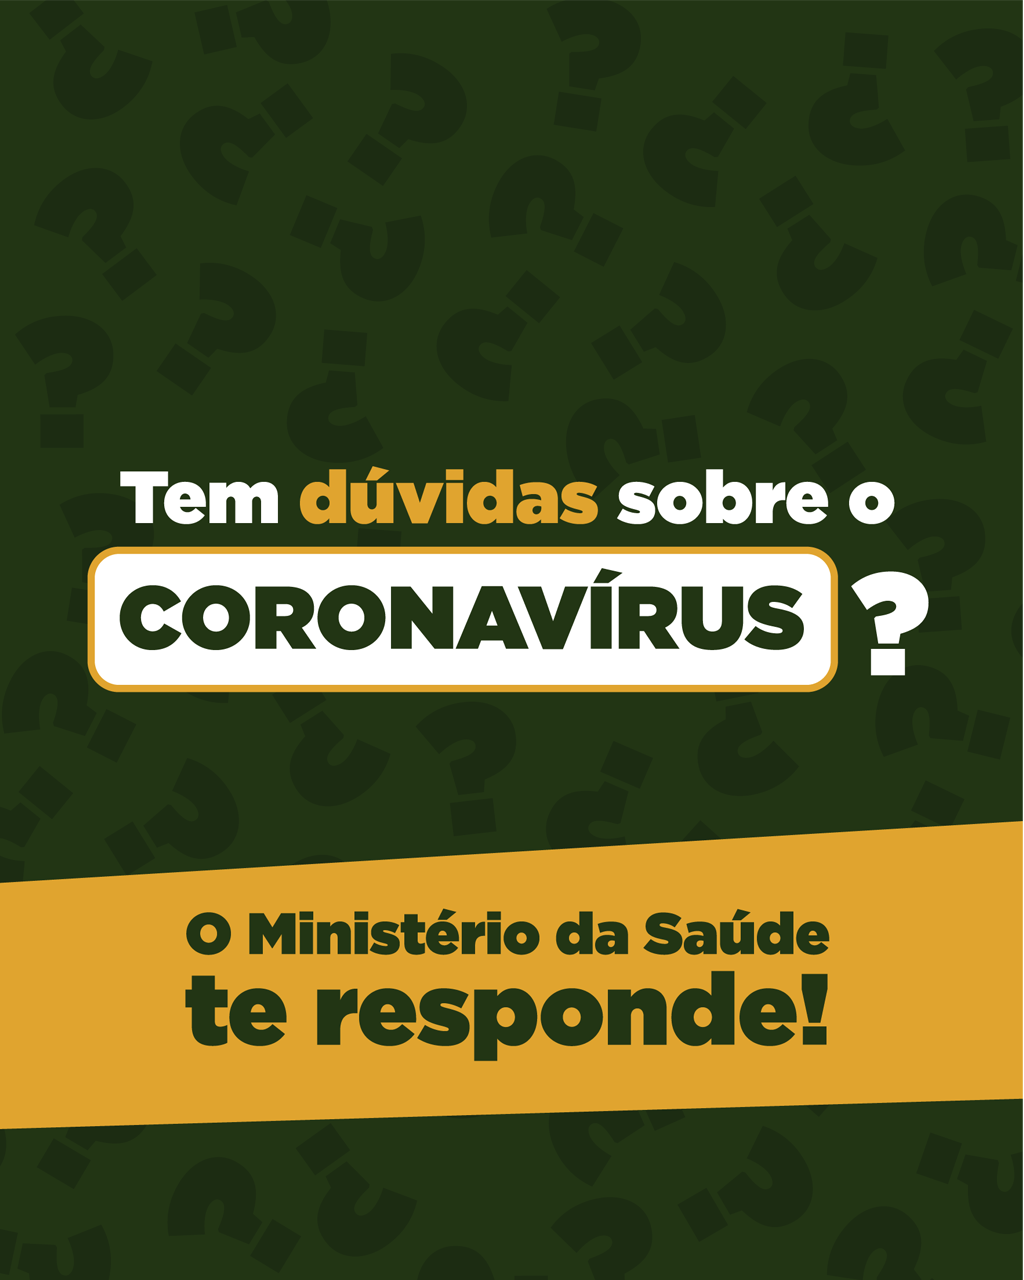 Minist-rio-da-Sa-de_d-vidas.png